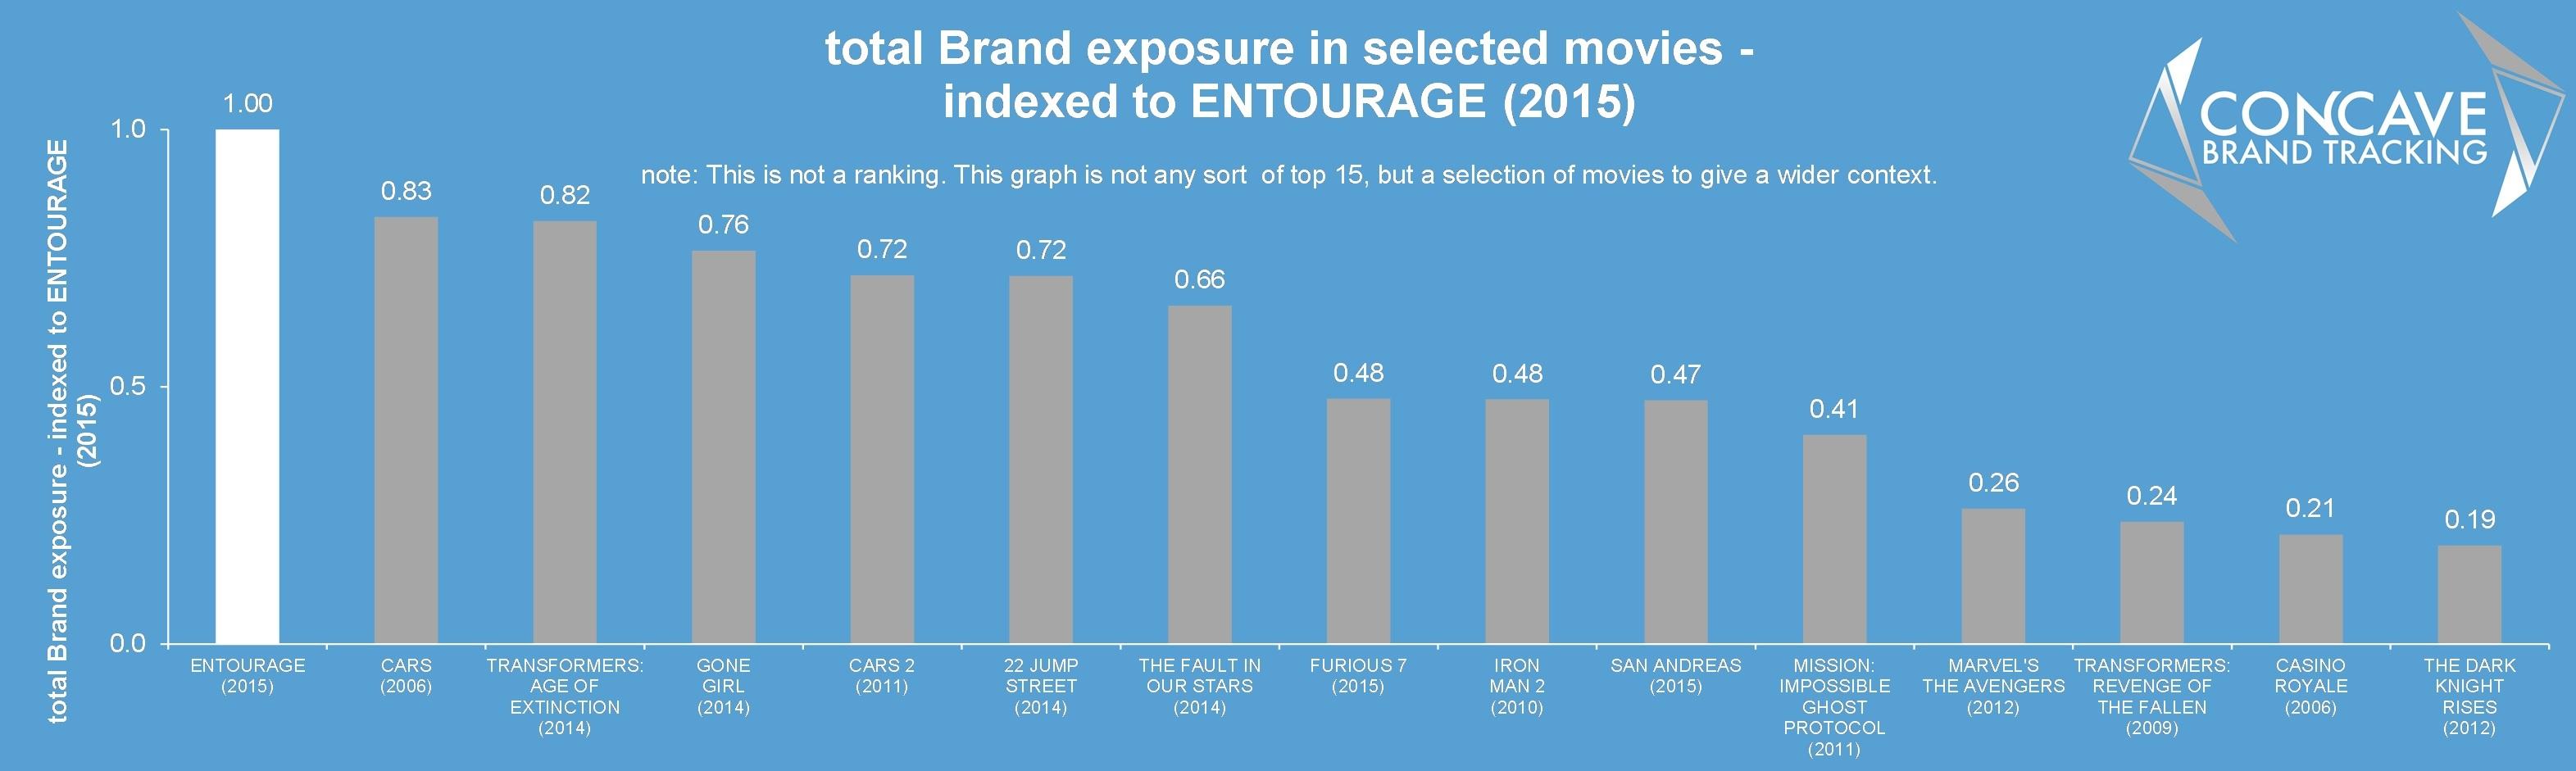 entourage brands in movies